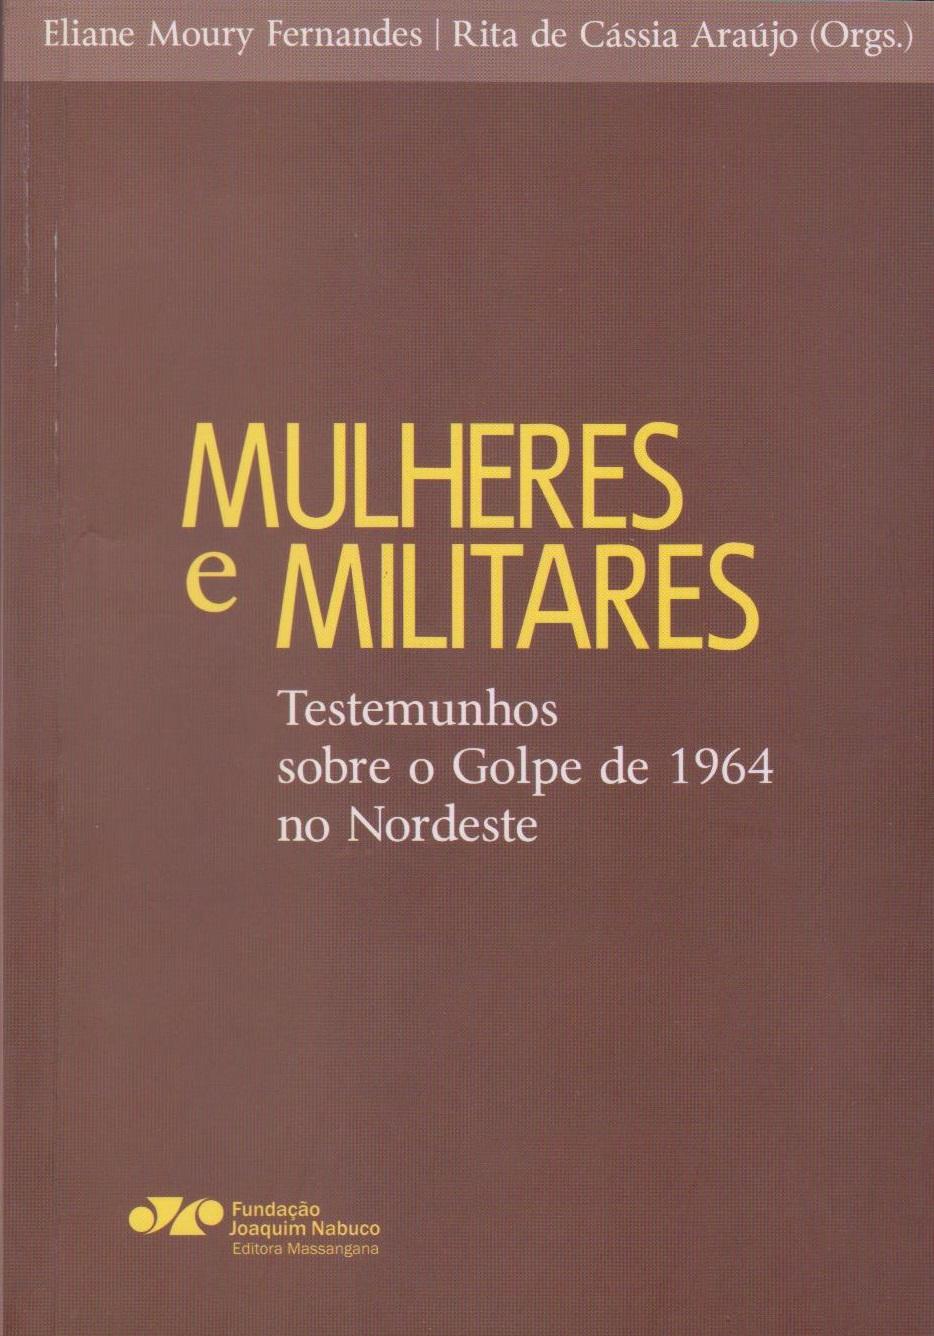 Mulheres e militares - Testemunhos sobre o Golpe de 1964 no Nordeste, livro de Eliane Moury Fernandes, Rita de Cássia Araújo (orgs.)